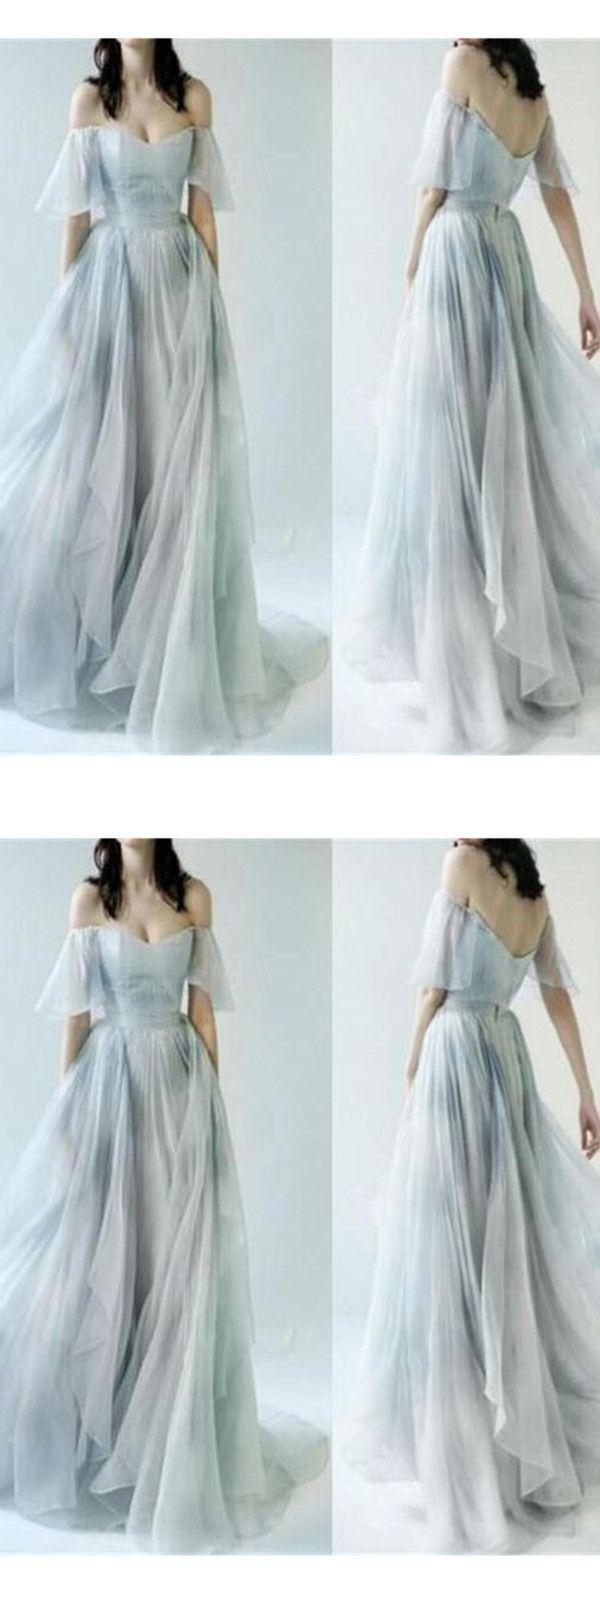 aa6edfb9050 Chic A Line Prom Dress Modest Elegant Cheap Long Prom Dress  VB2021 ...